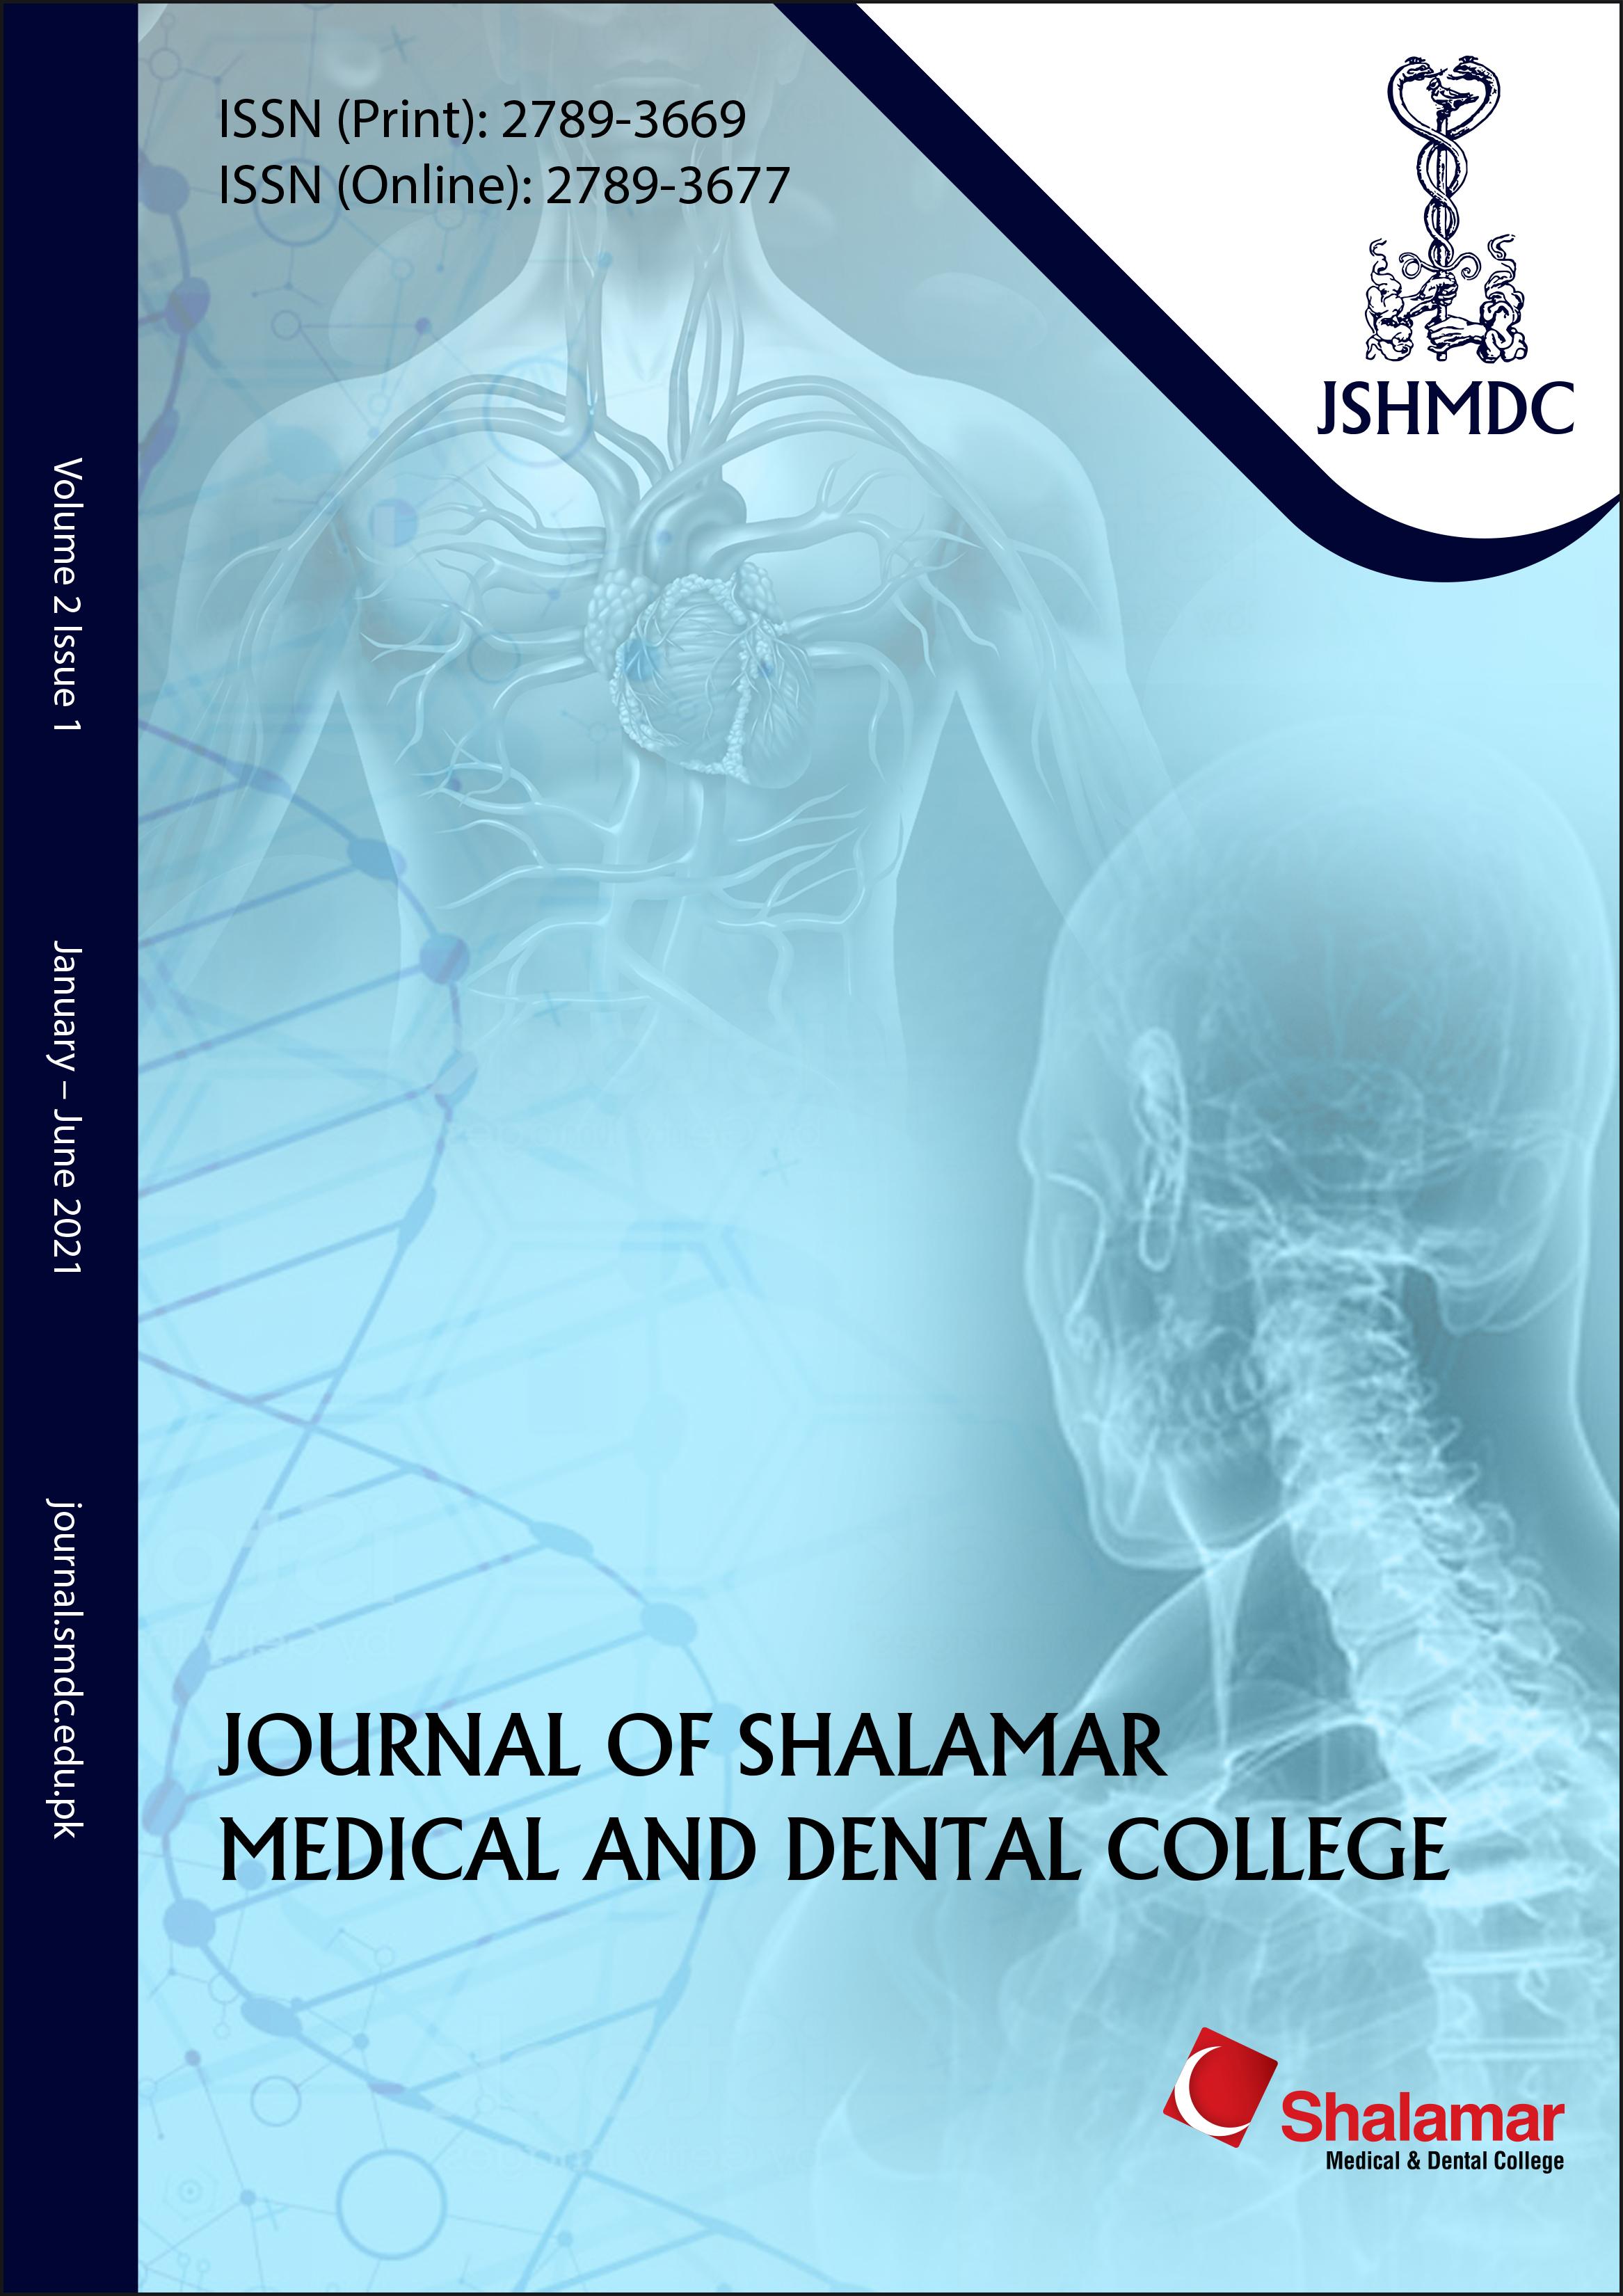 View Vol. 2 No. 1 (2021): Journal of Shalamar Medical & Dental College